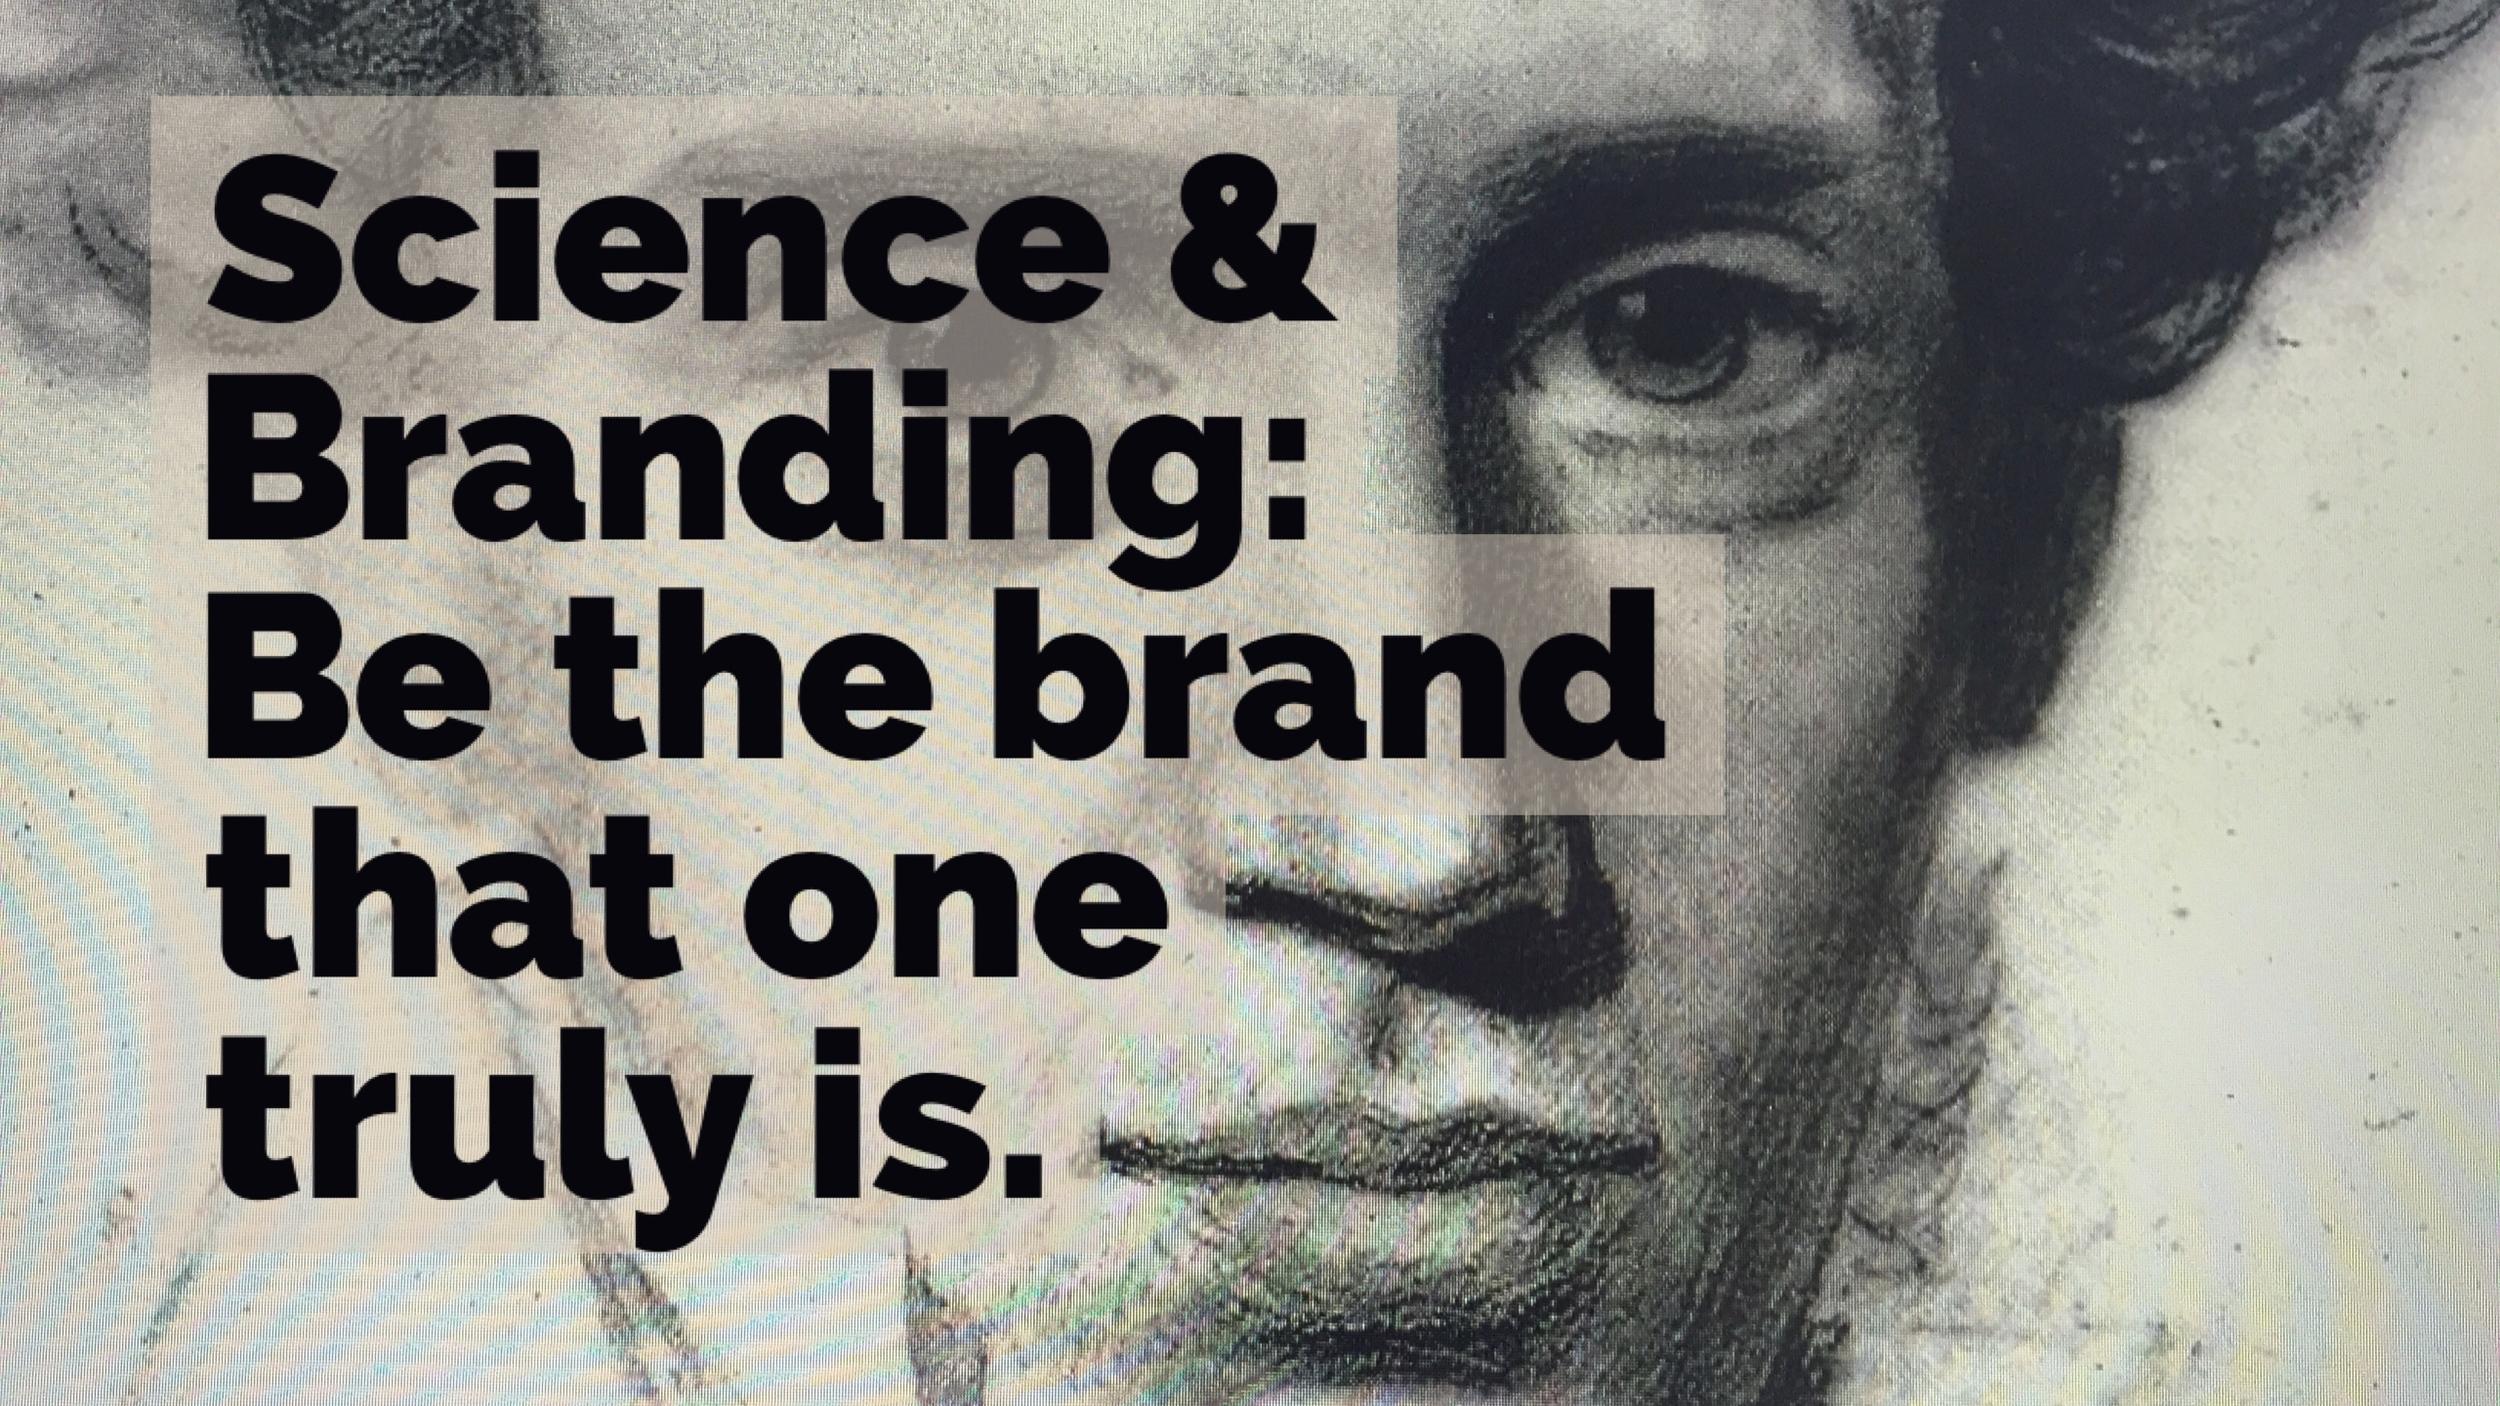 chris_w_hubbard_science_and_branding